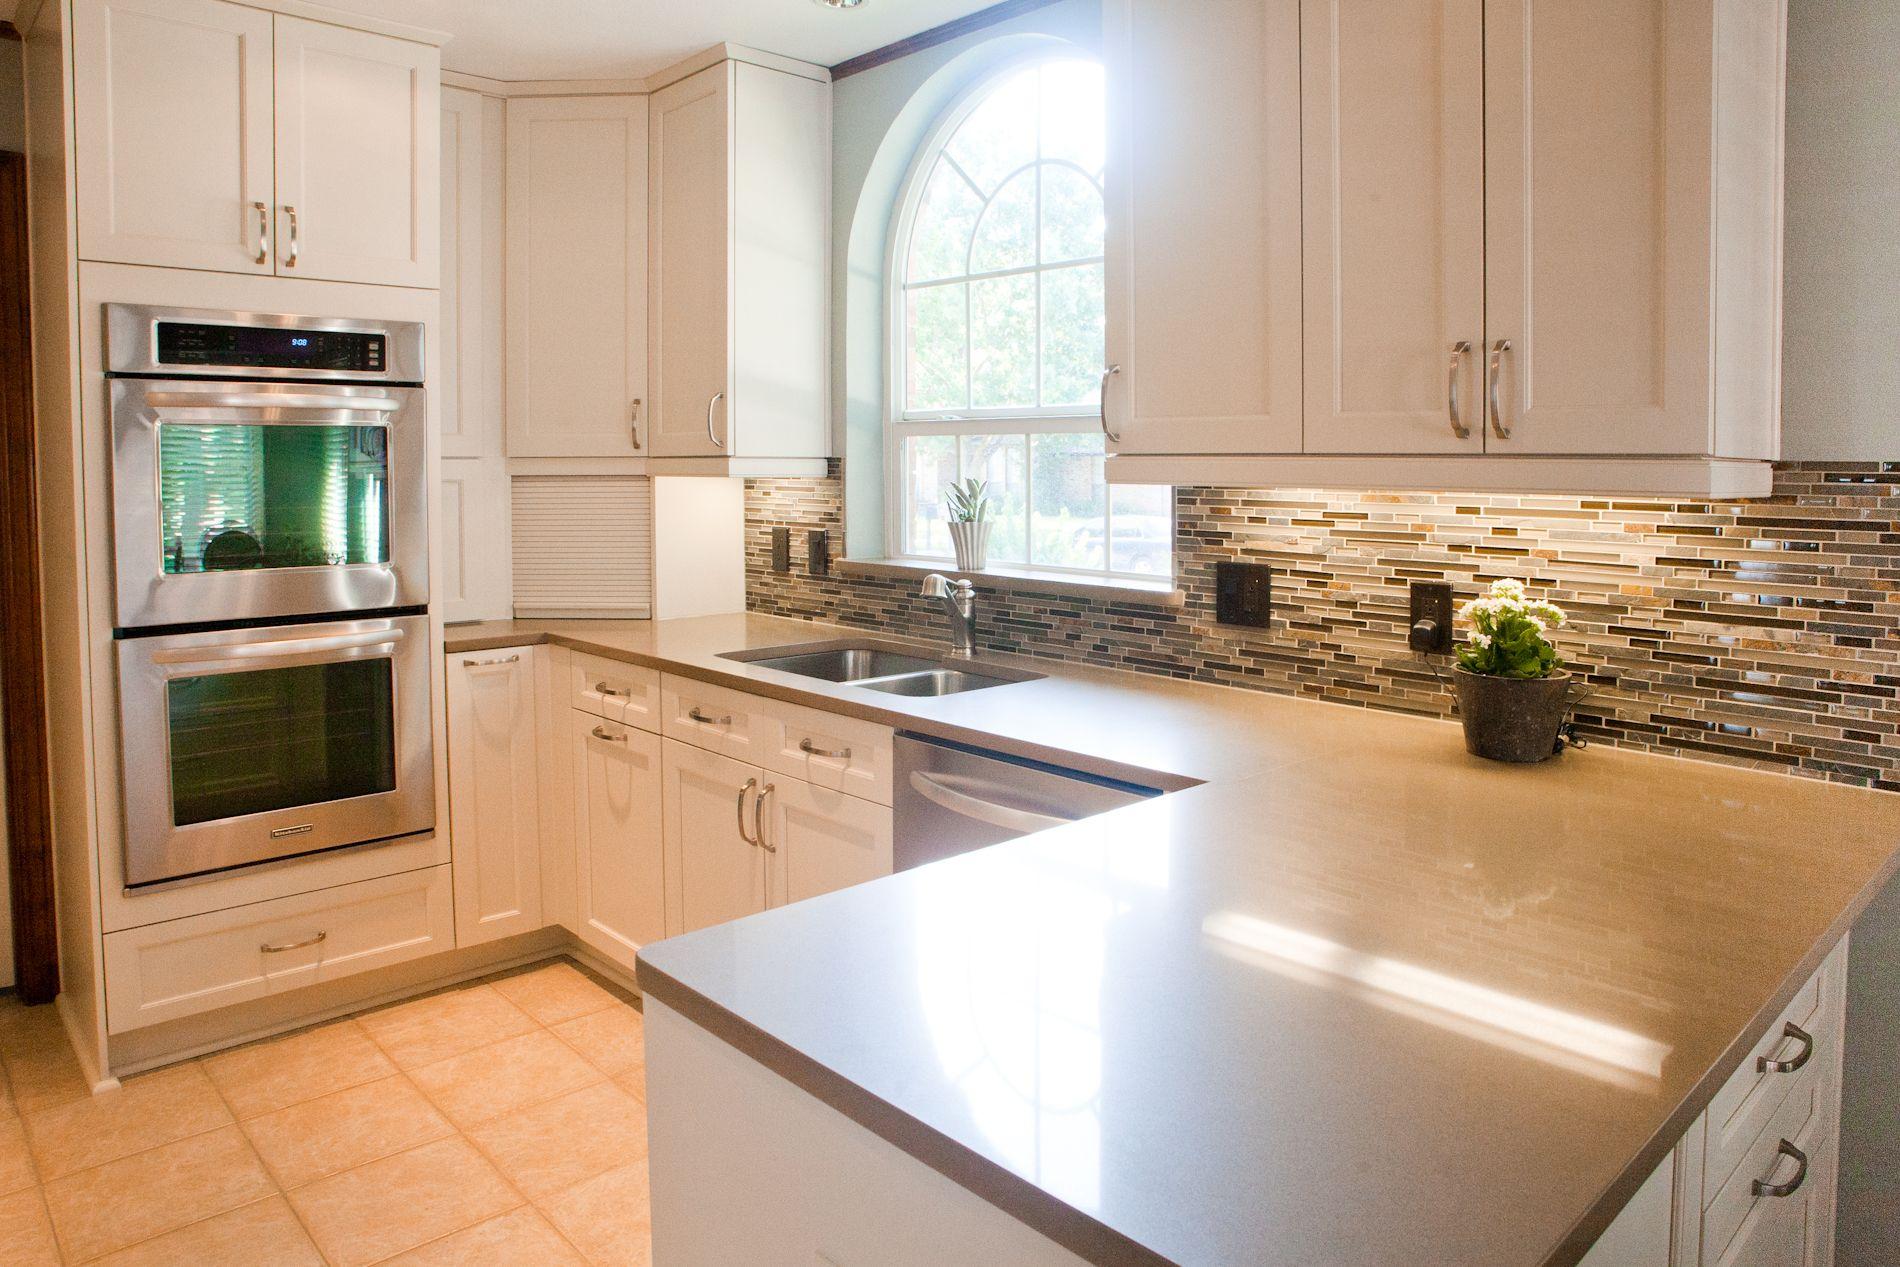 Kitchencraft cabinets, Lexington door in Seashell | Glazzio Sag ...